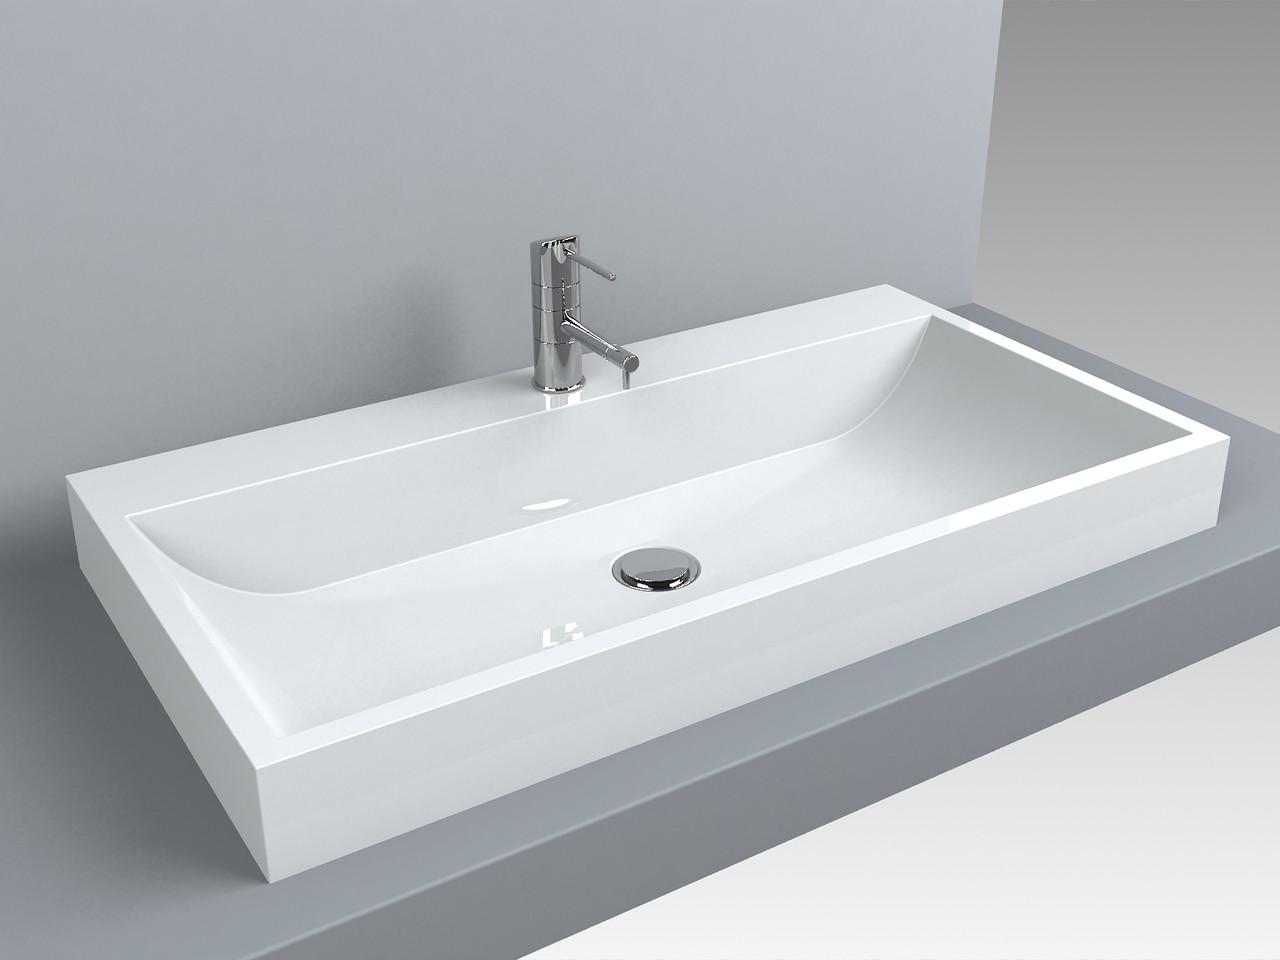 Раковина для ванной Miraggio VARNA 800 (белый глянцевый/ 80*42 см)